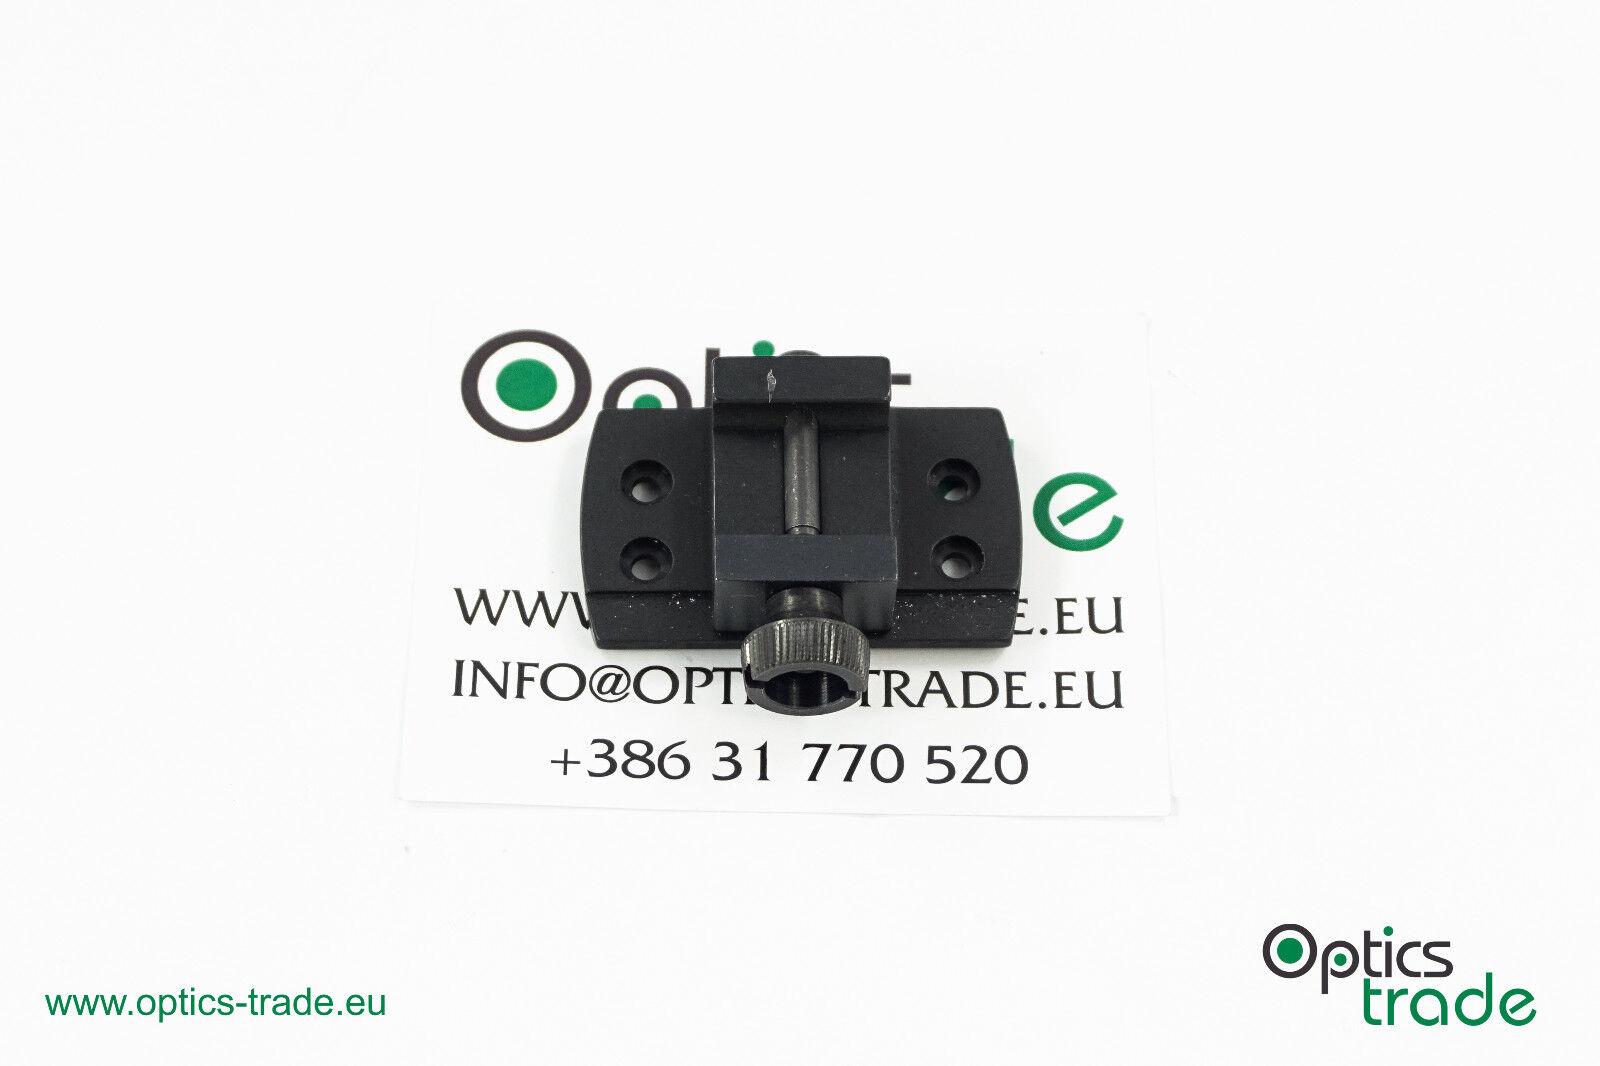 Eaw Adaptador para carril Picatinny Weaver, Aimpoint Micro